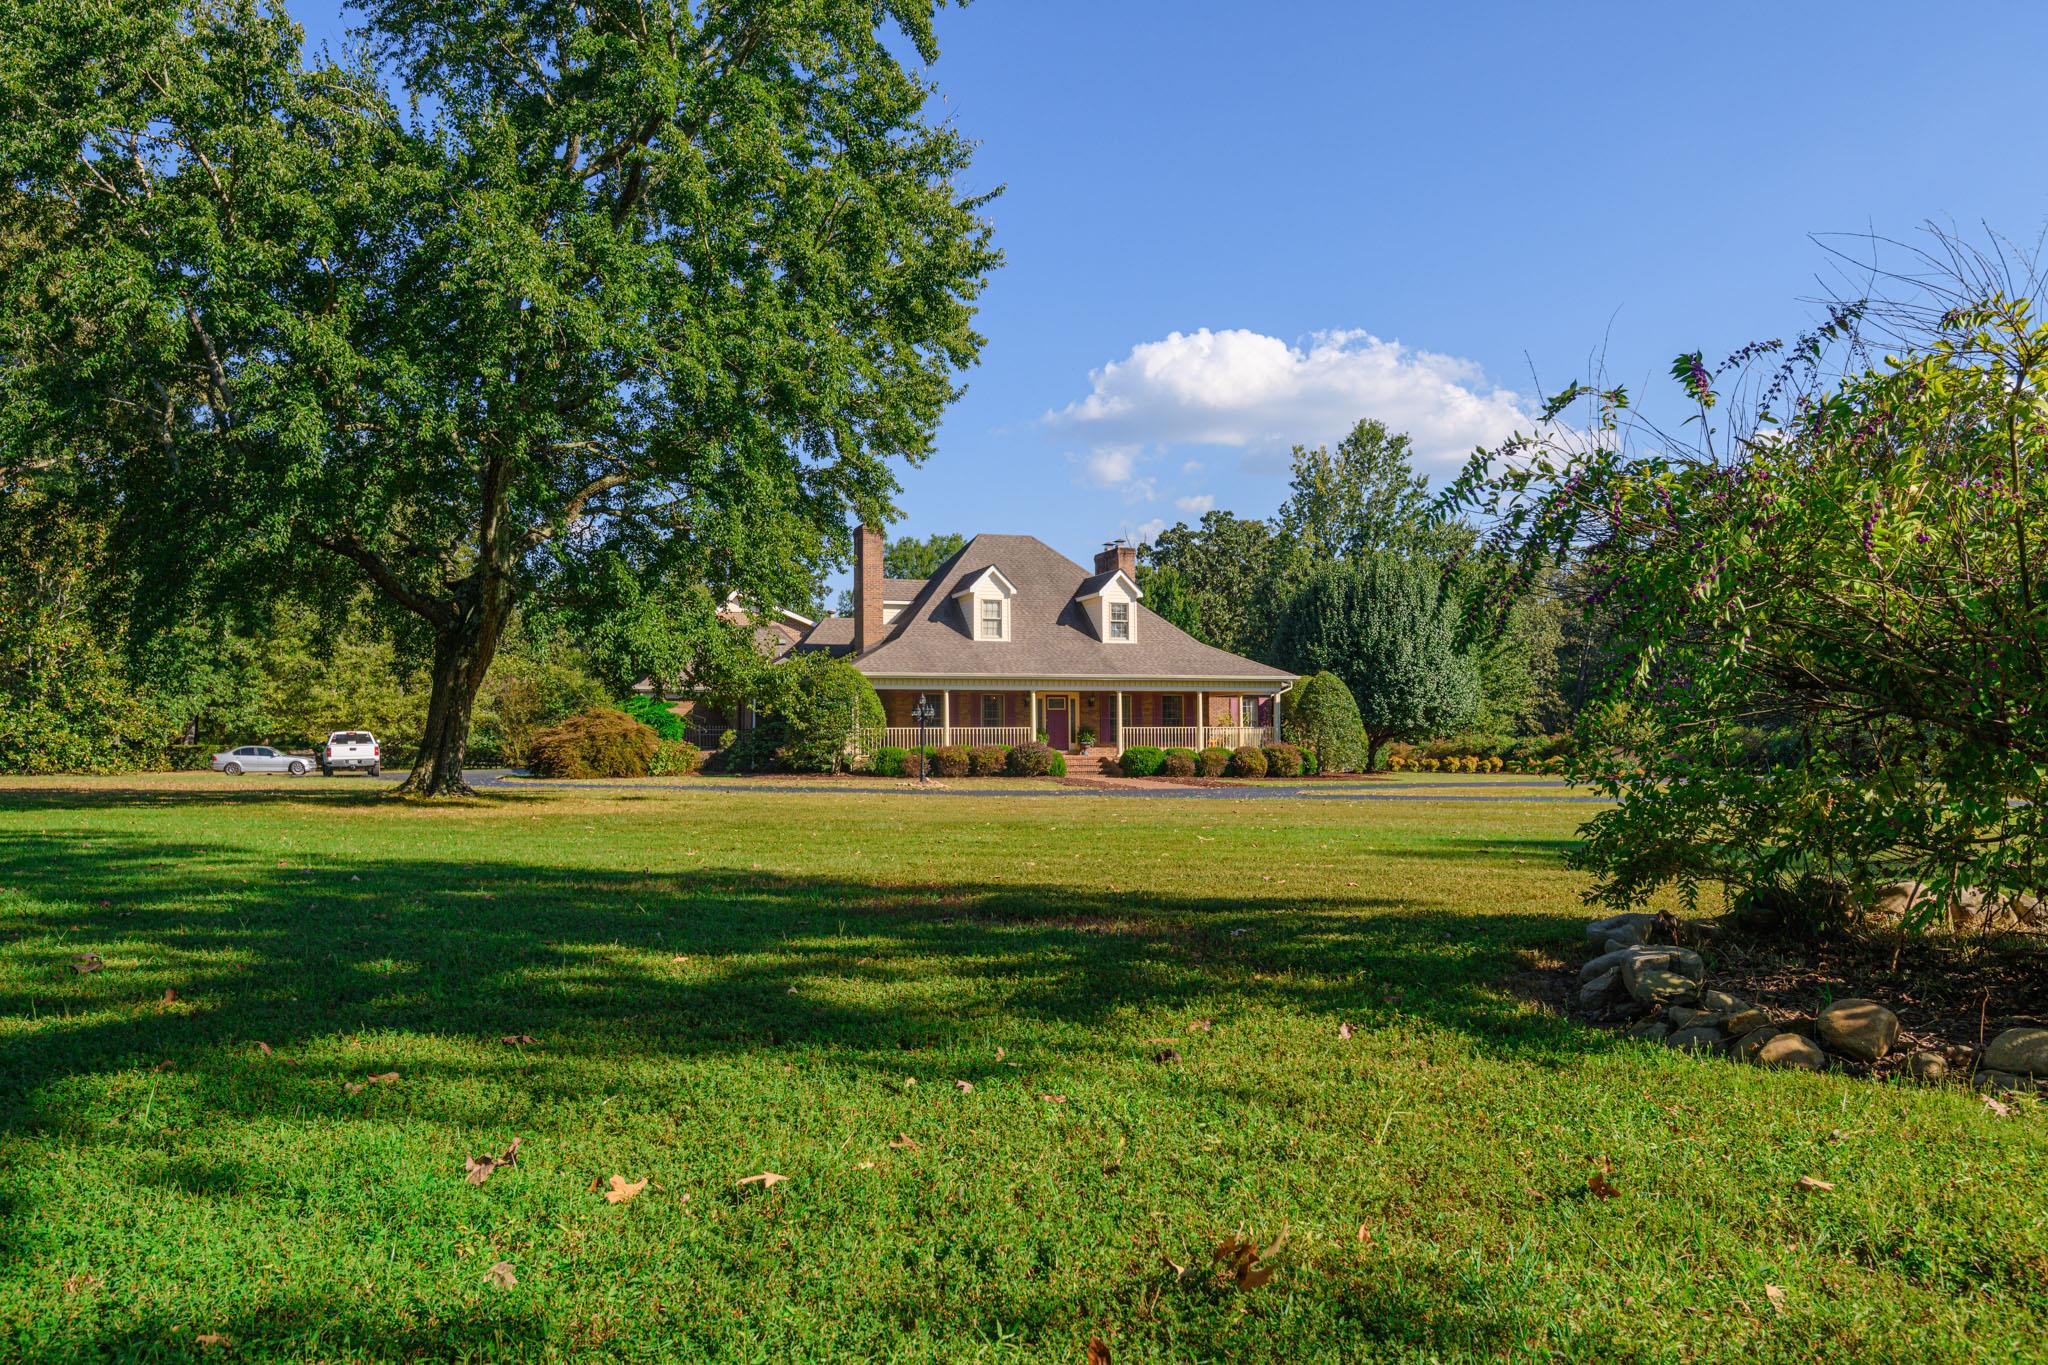 1800 OVOCA ROAD, Tullahoma, TN 37388 - Tullahoma, TN real estate listing